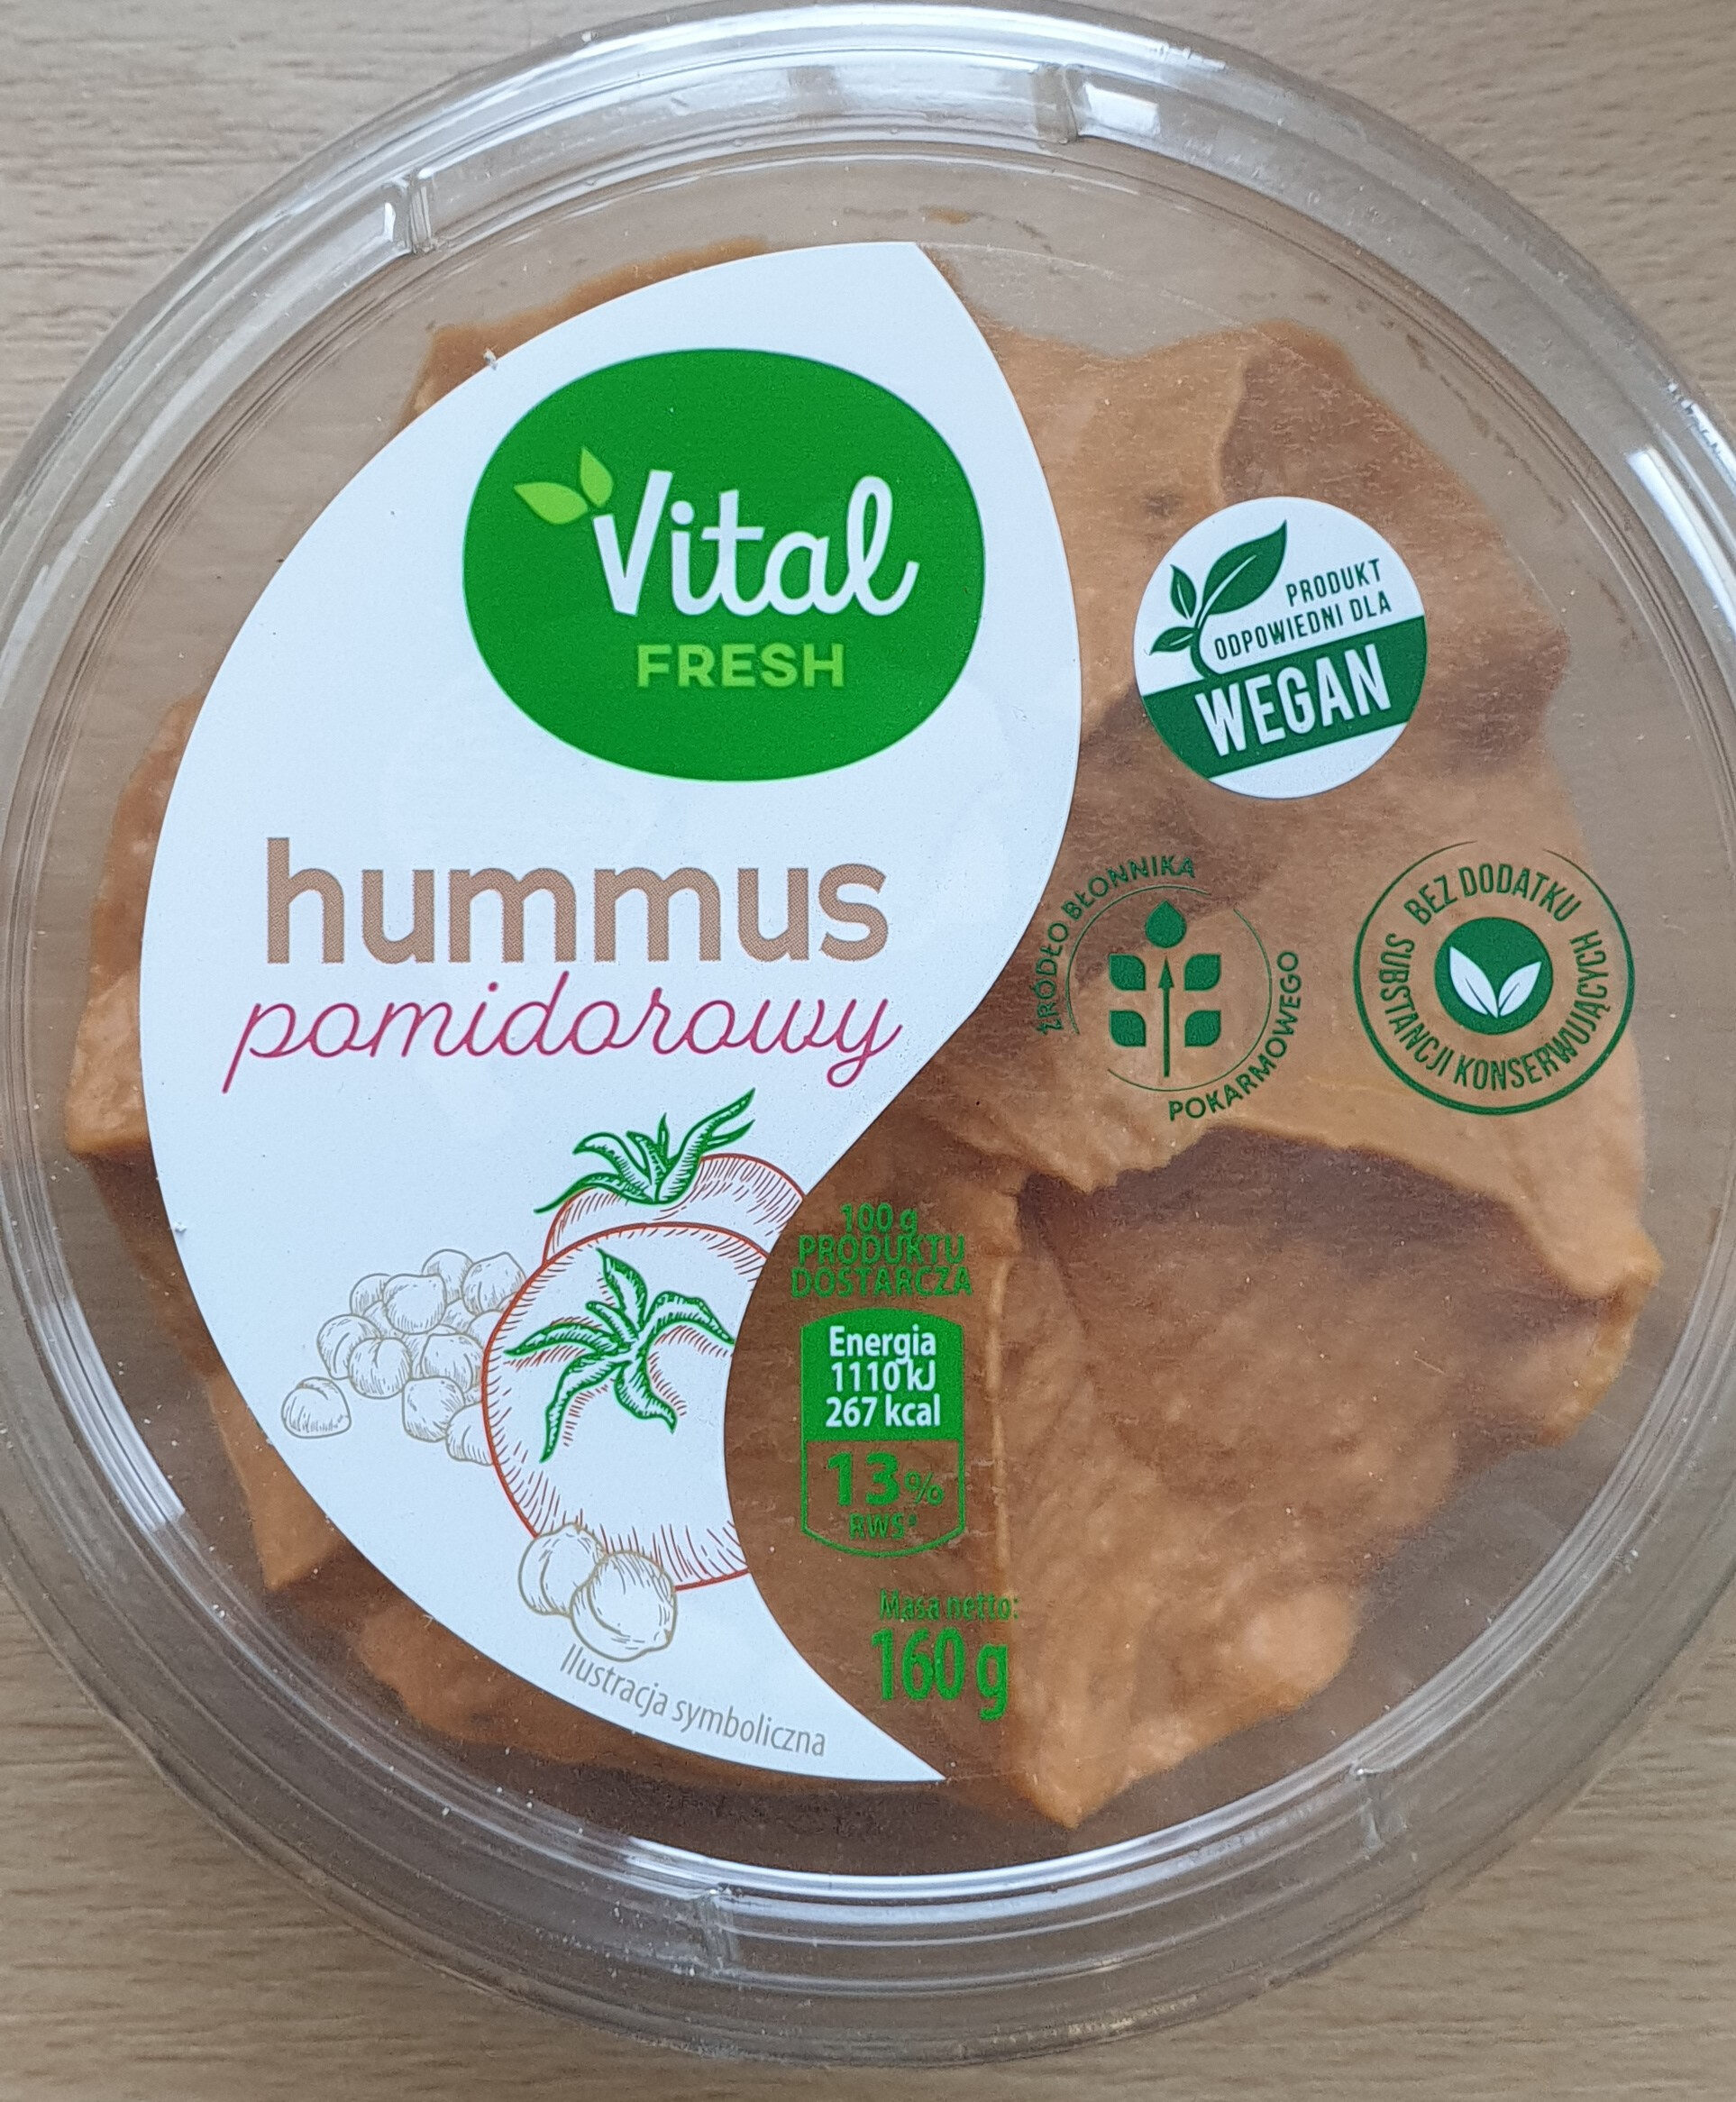 Hummus pomidorowy - Produkt - pl